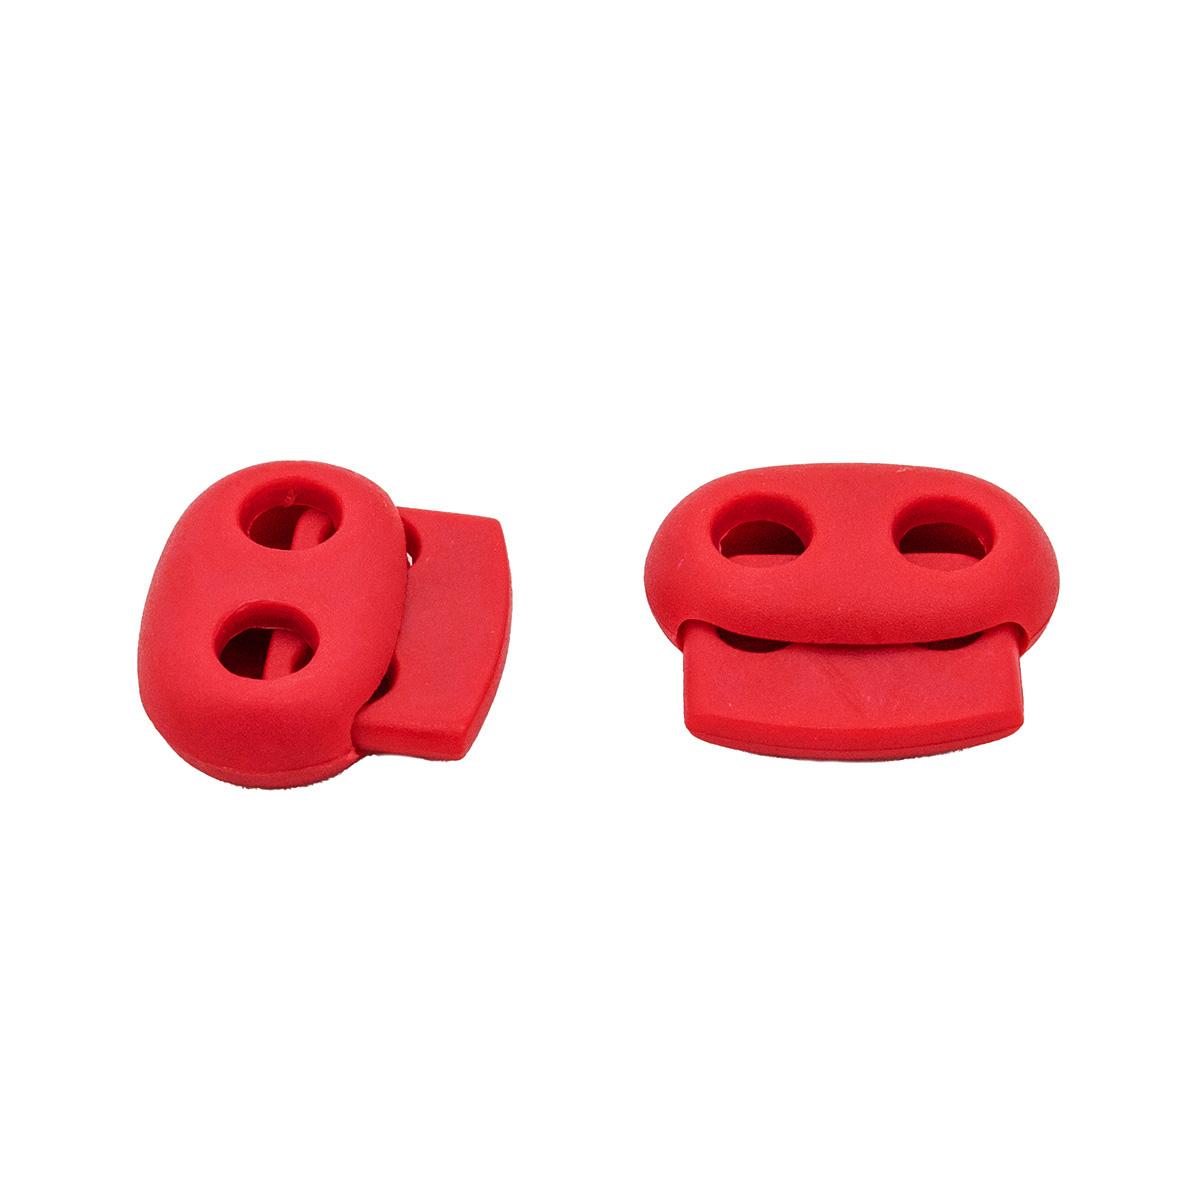 0305-3131 Стопор плоский 2отв. d=4,5мм, 20*18мм, 4шт, пластик Hobby&Pro